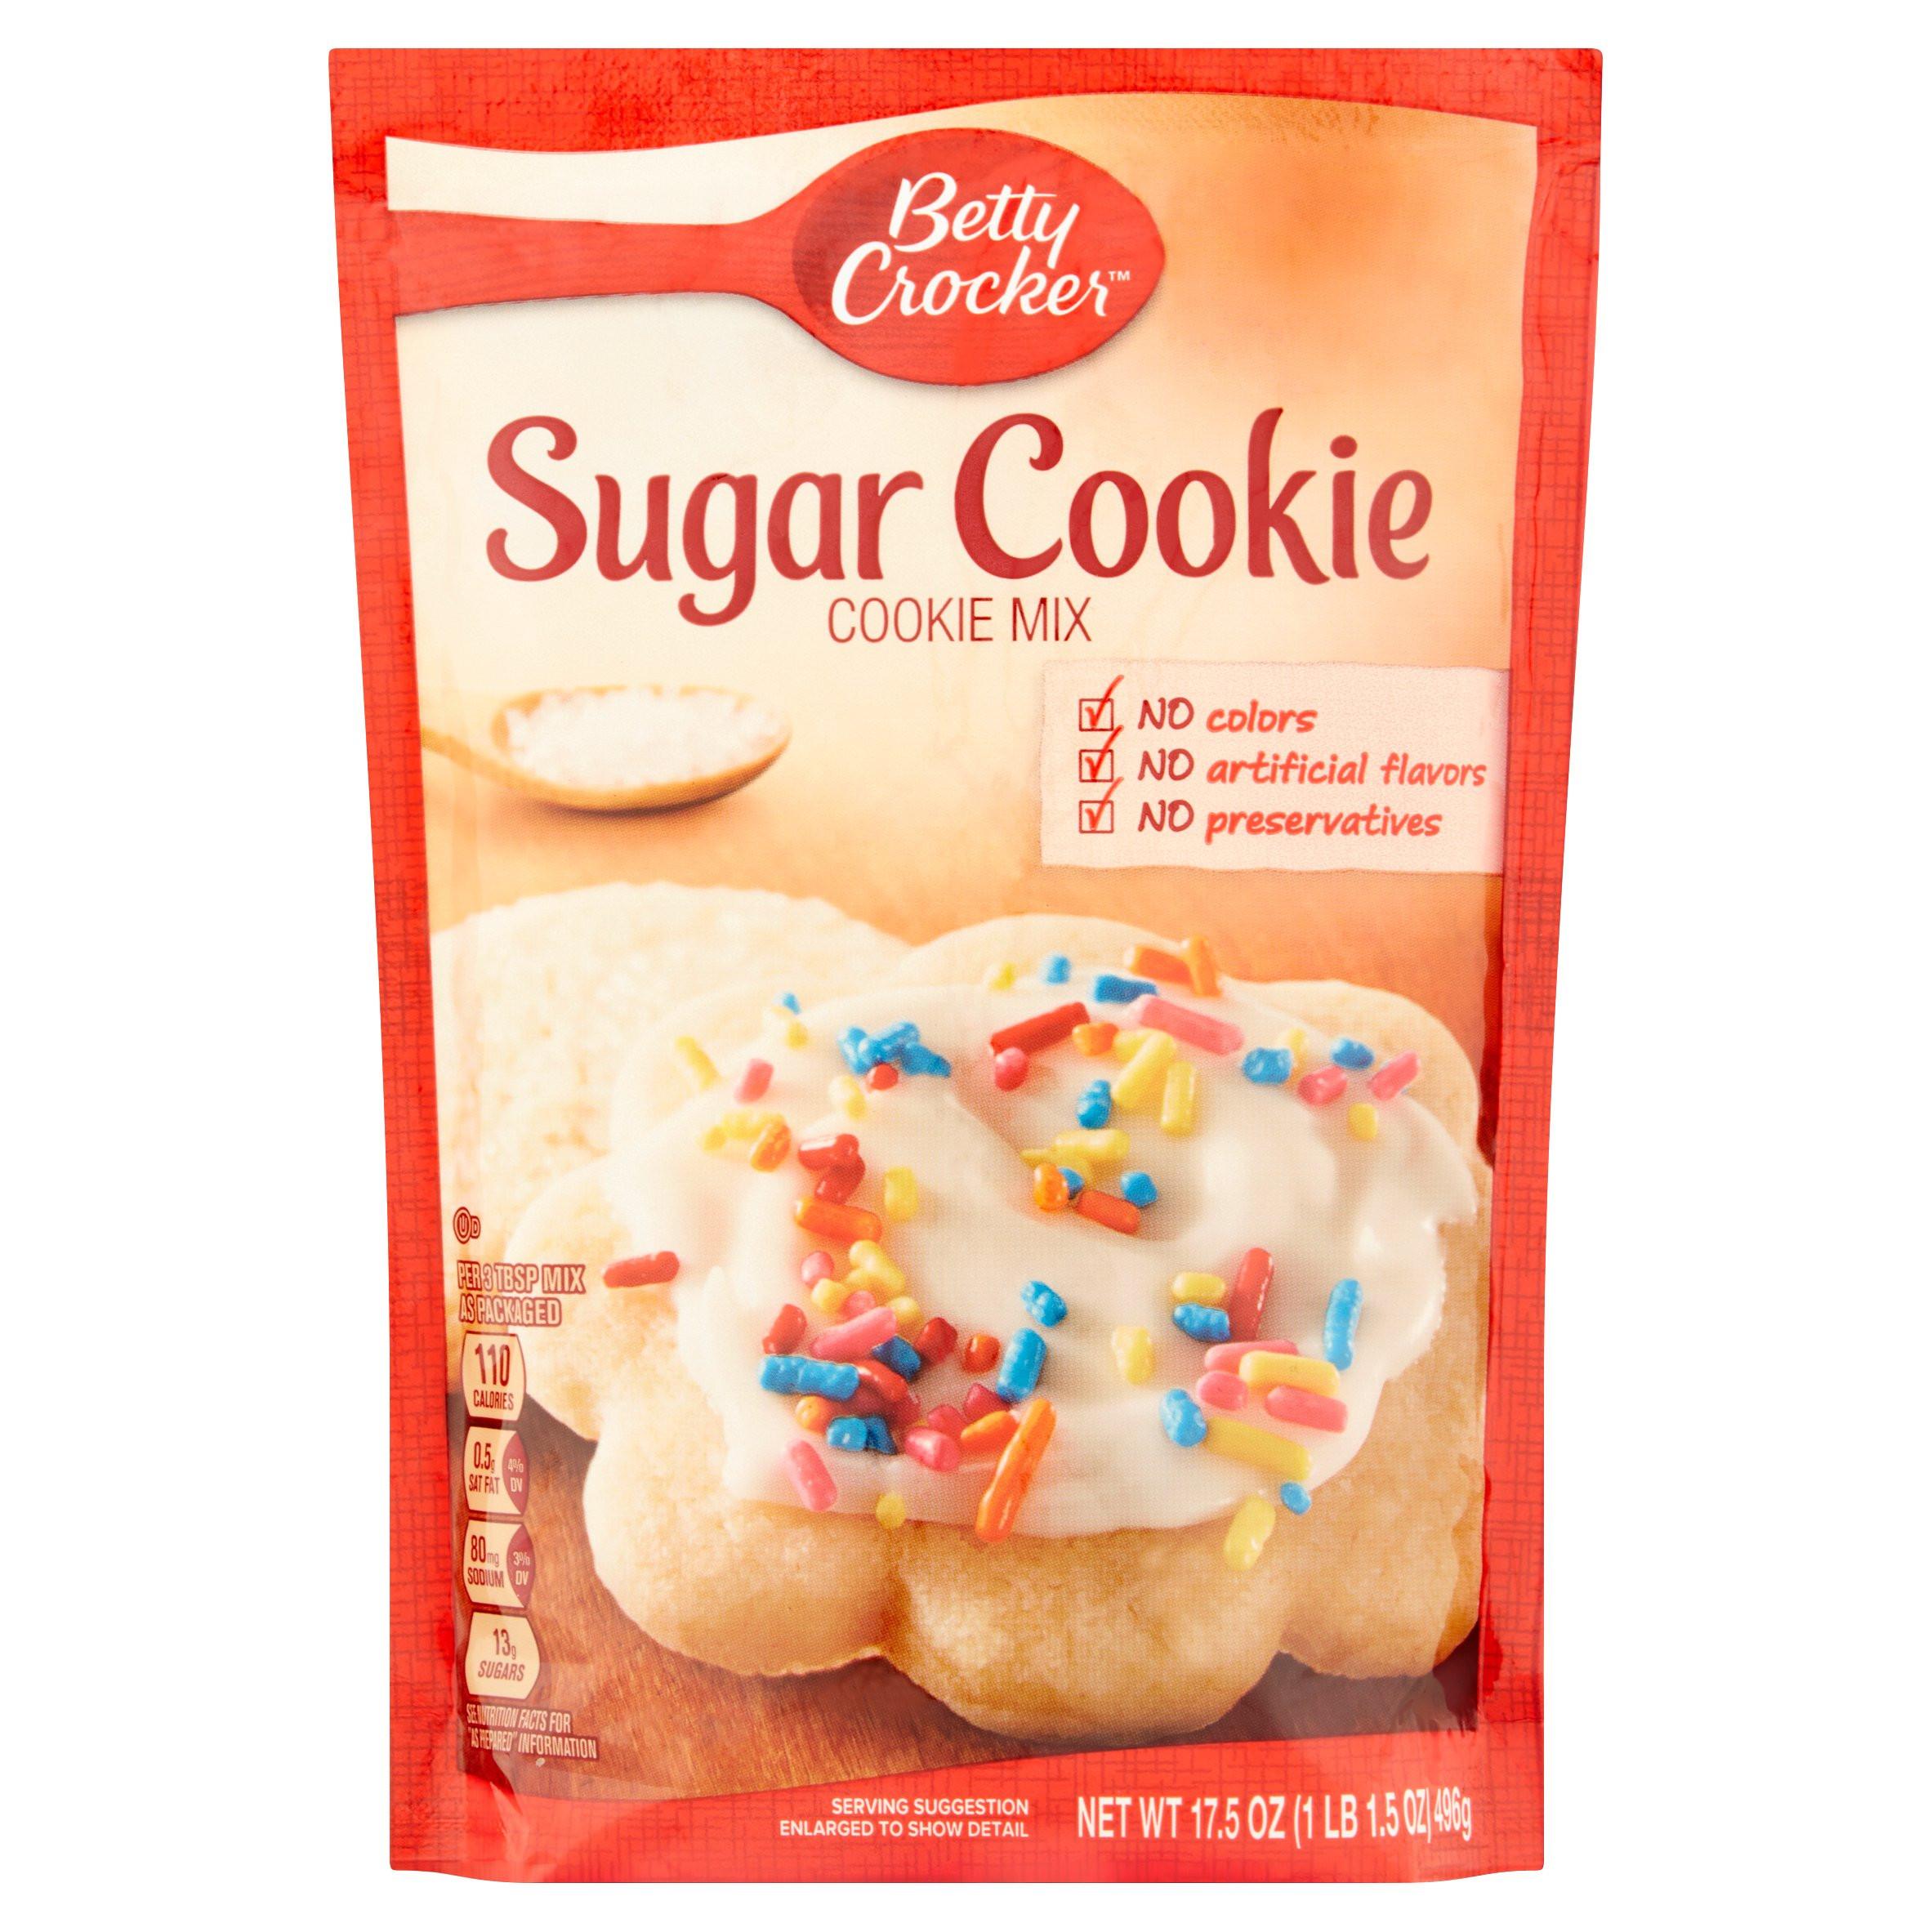 Betty Crocker Sugar Cookies  betty crocker sugar cookie mix directions